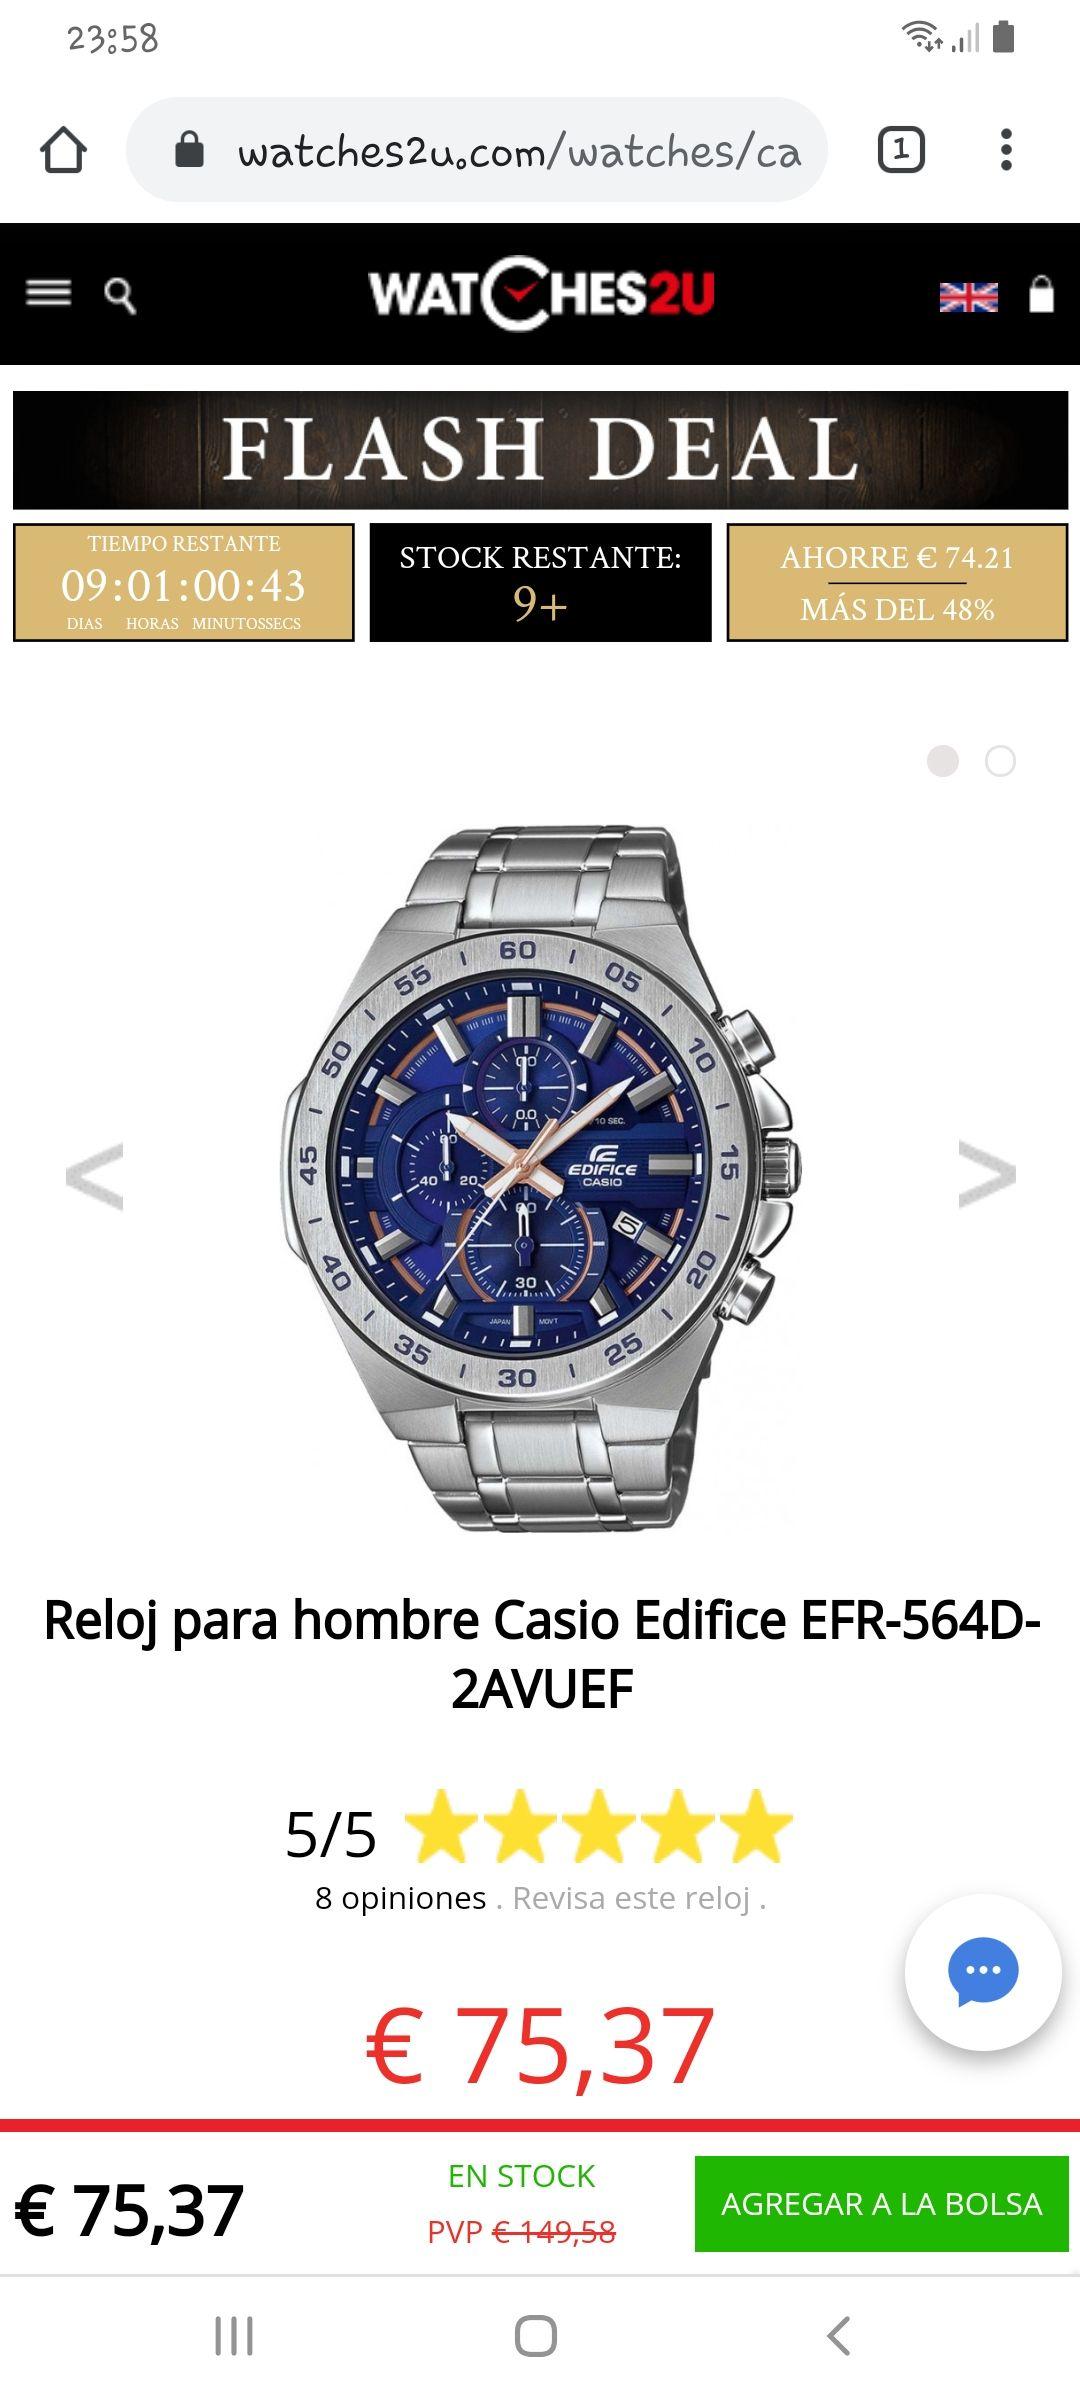 Relojpara hombreCasioEdificeEFR-564D-2AVUEF